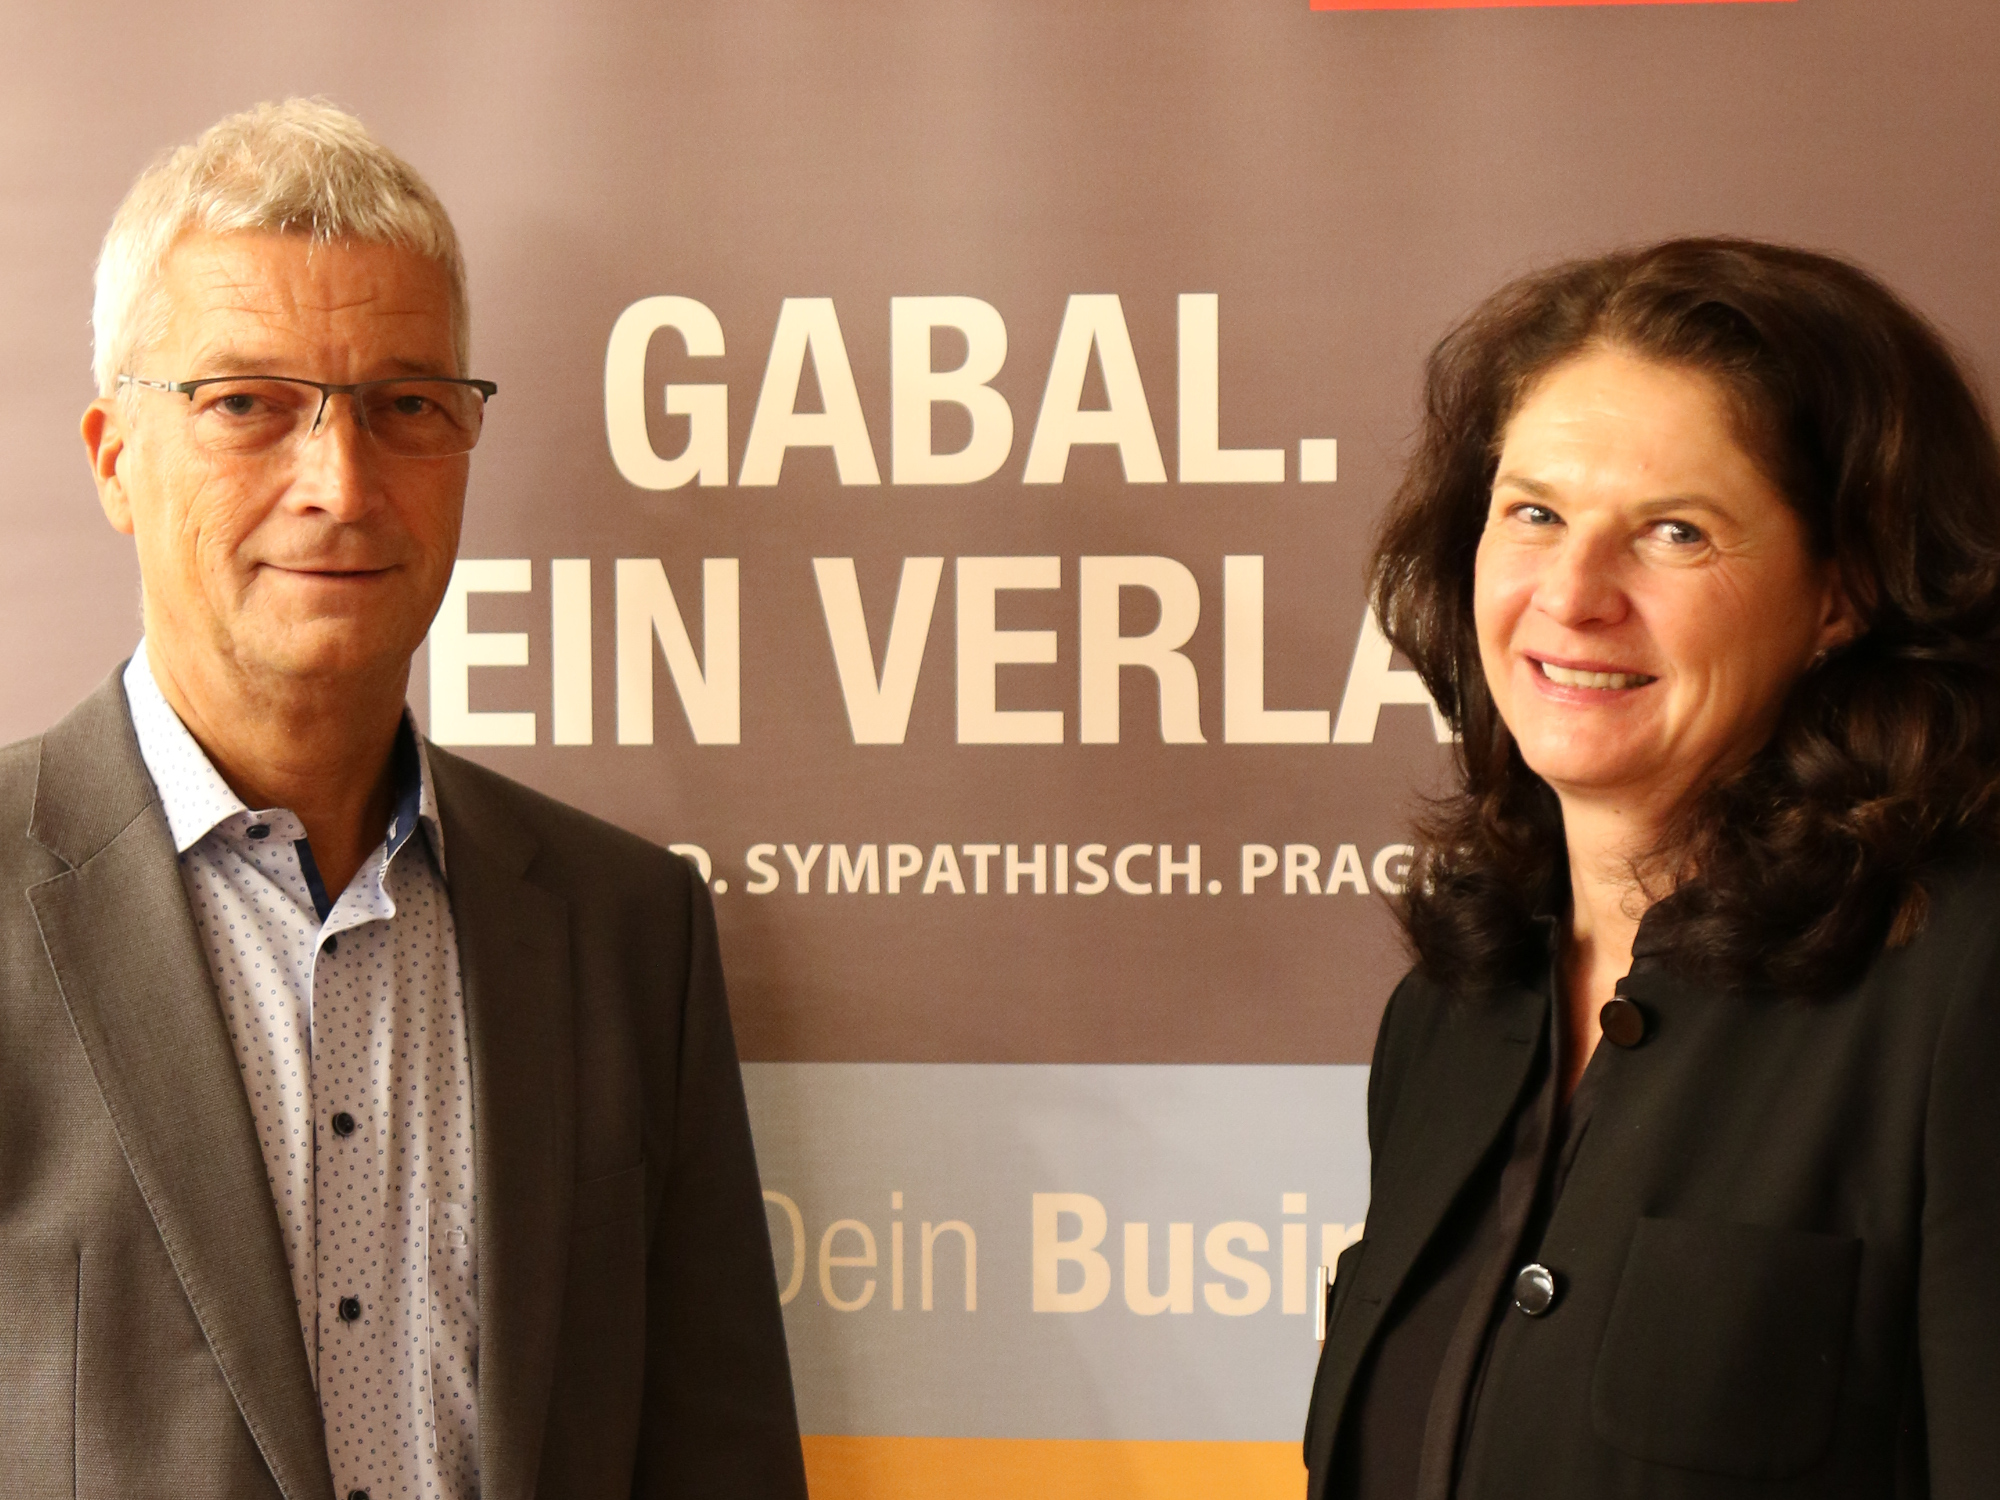 Abb. zu Artikel Geschäftsführerwechsel beim GABAL Verlag